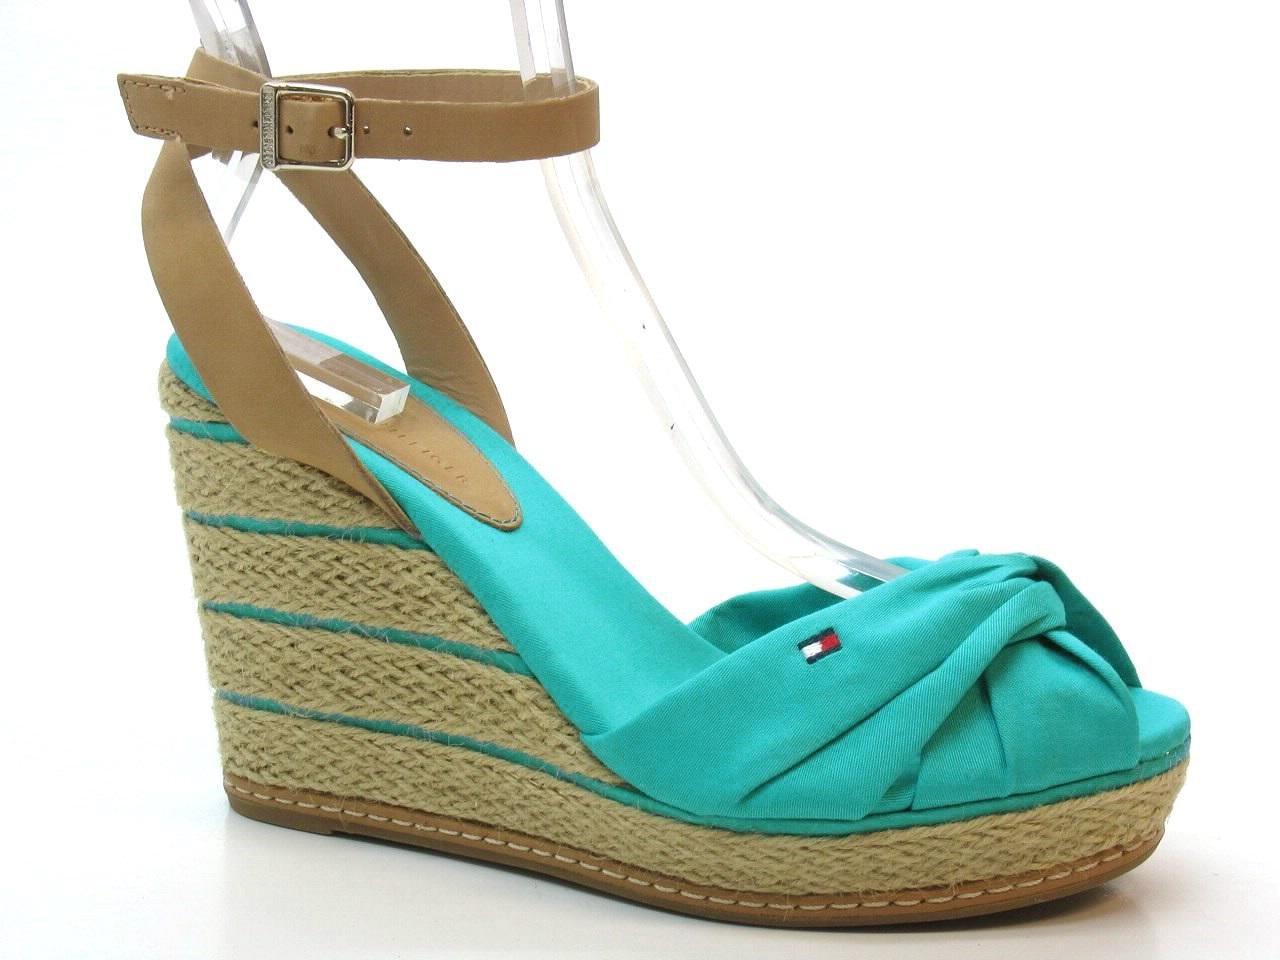 Sandálias de Cunha Tommy Hilfiger - 309 16769